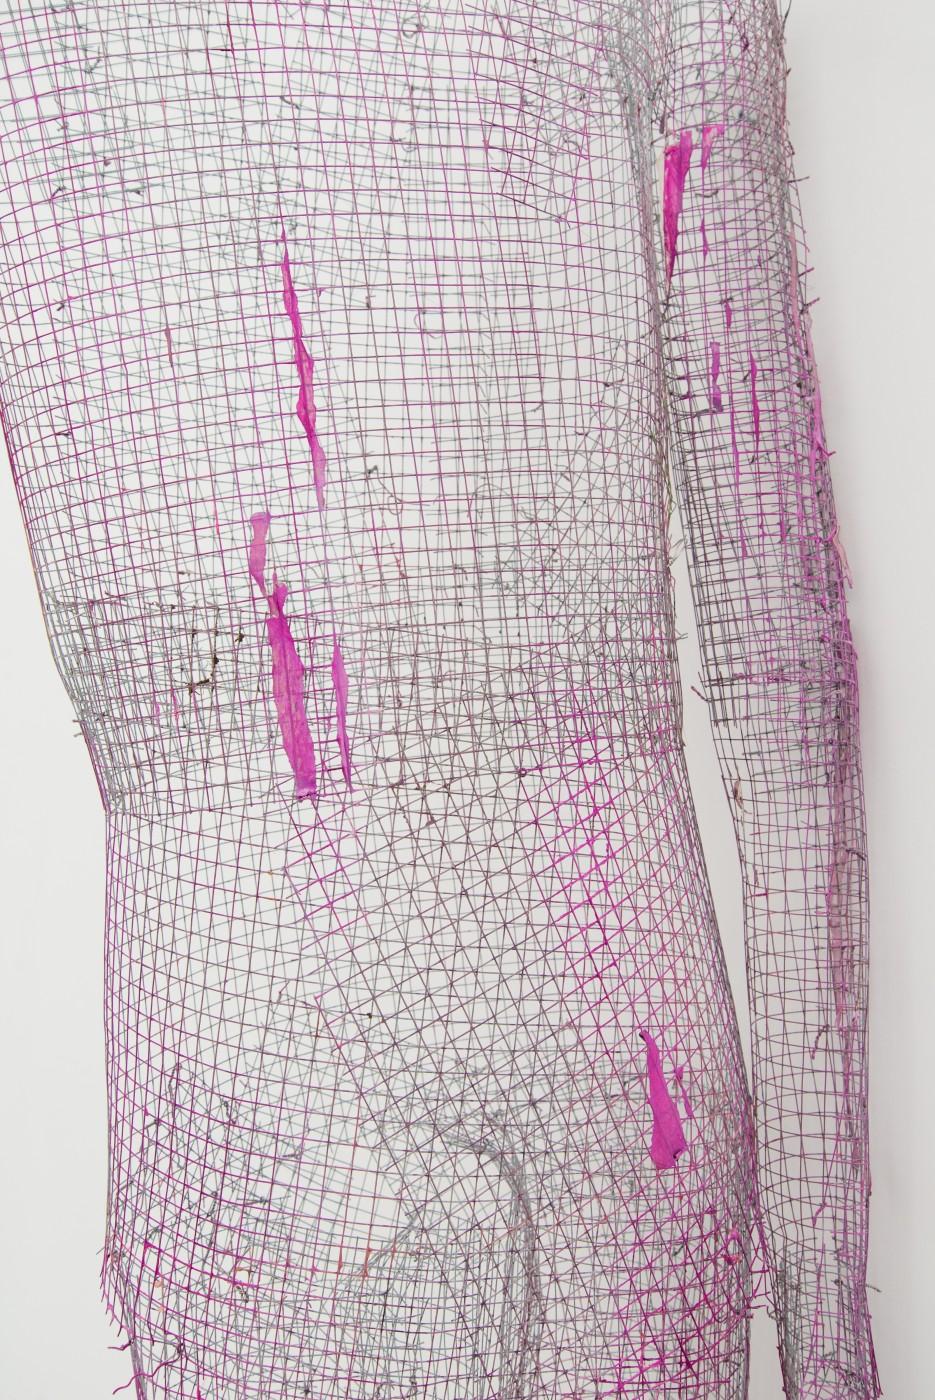 TOM HUMPHREYS  Figure Appuyée</I> (detail), 2018 Metal, paint, paper 230 × 63 × 25 cm / 90.5 × 24.8 × 9.8 in